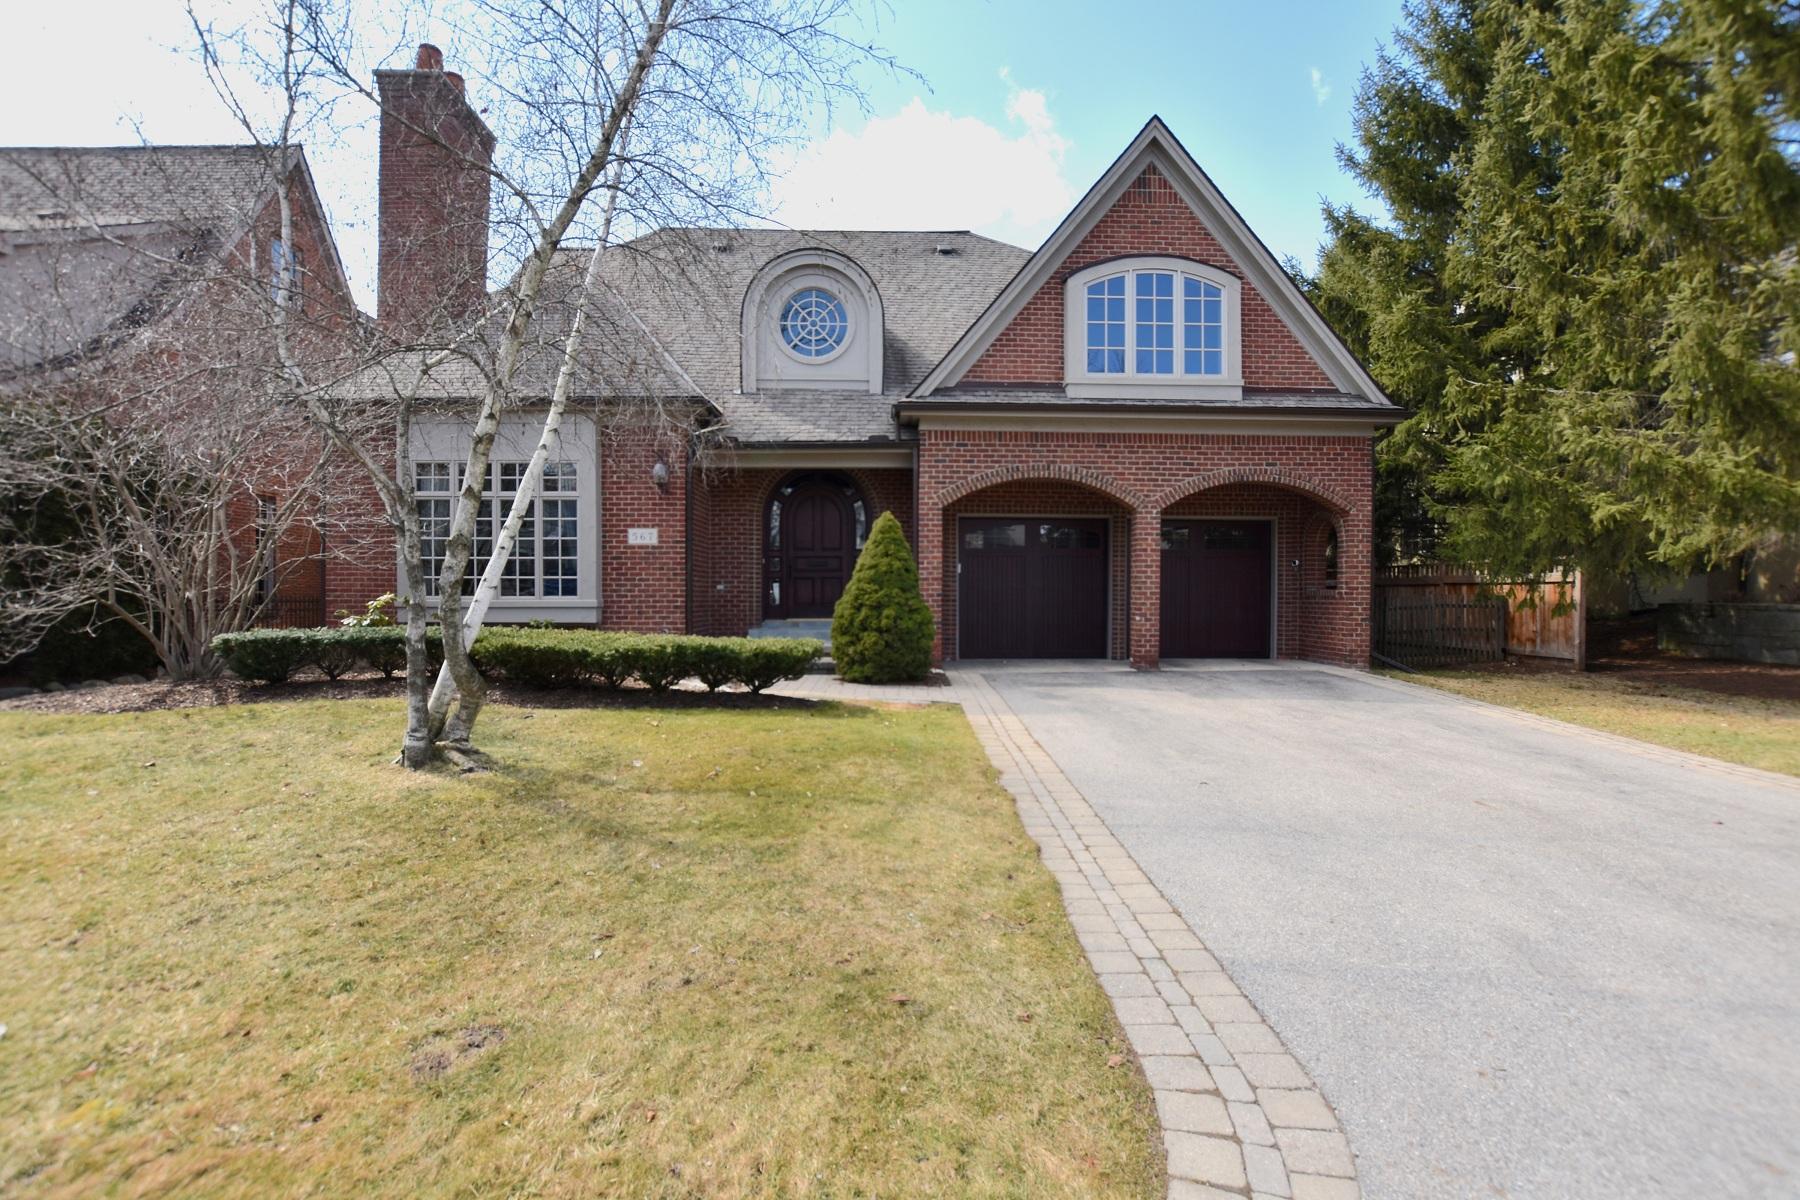 Single Family Homes for Sale at Birmingham 567 Baldwin Court Birmingham, Michigan 48009 United States